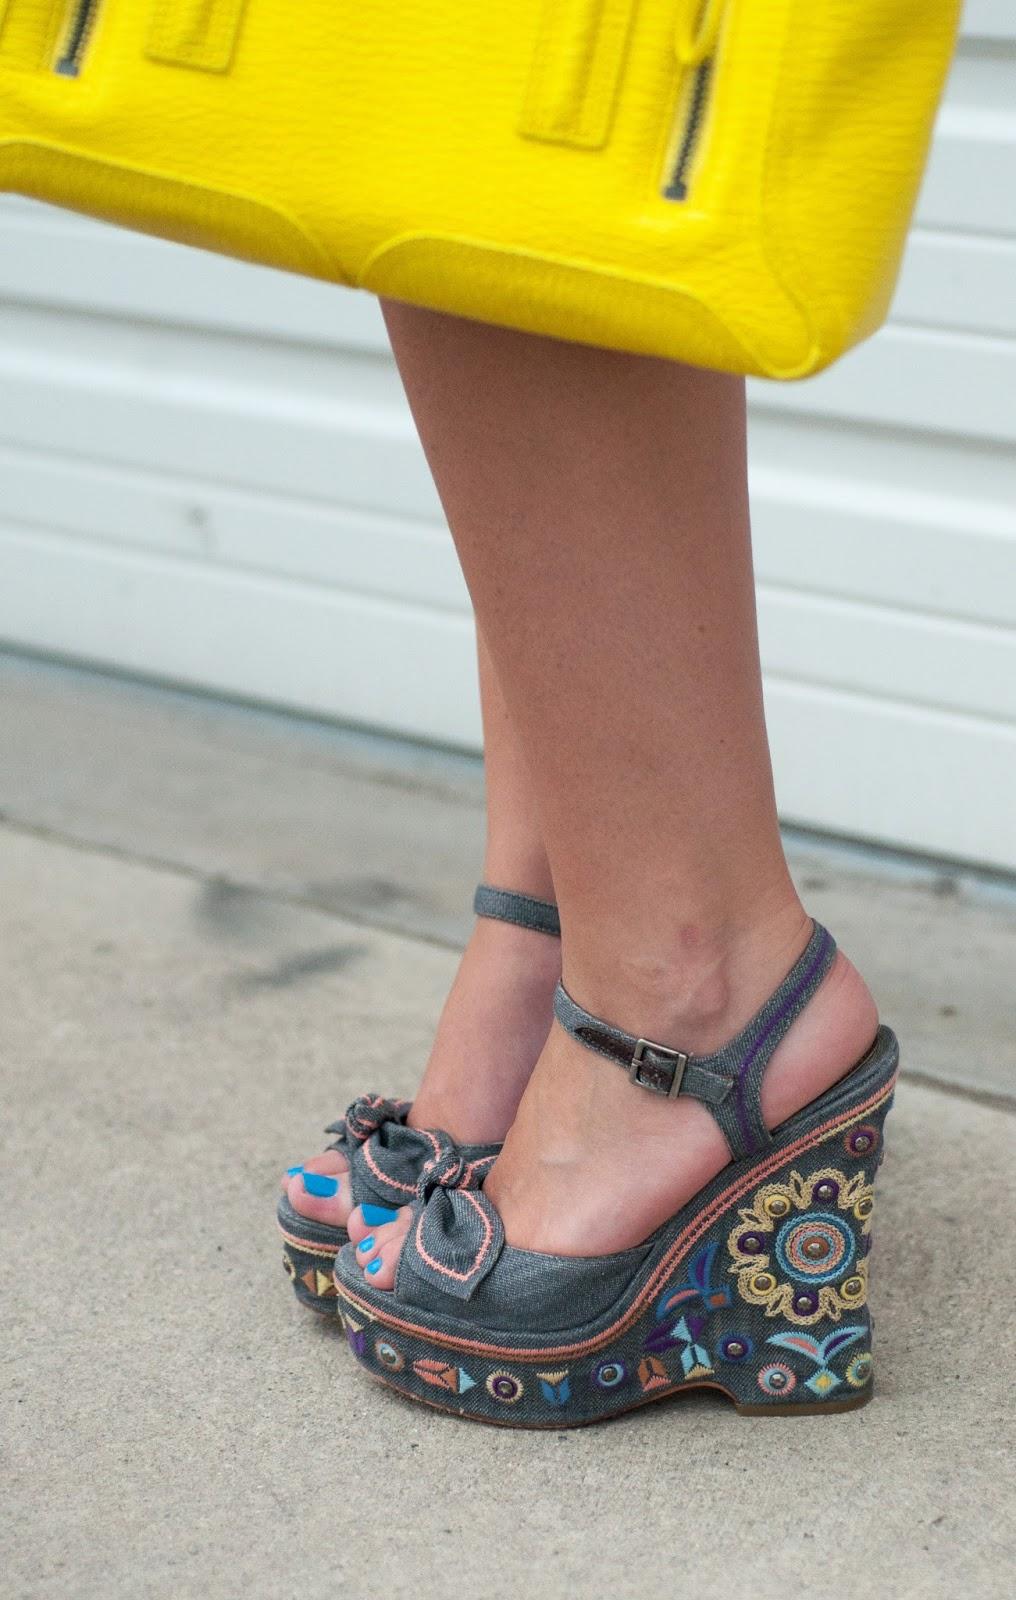 sam edelman wedges, bow shoes, ootd, what I wore, fashion blogger, style blog, phillip lim pashli satchel